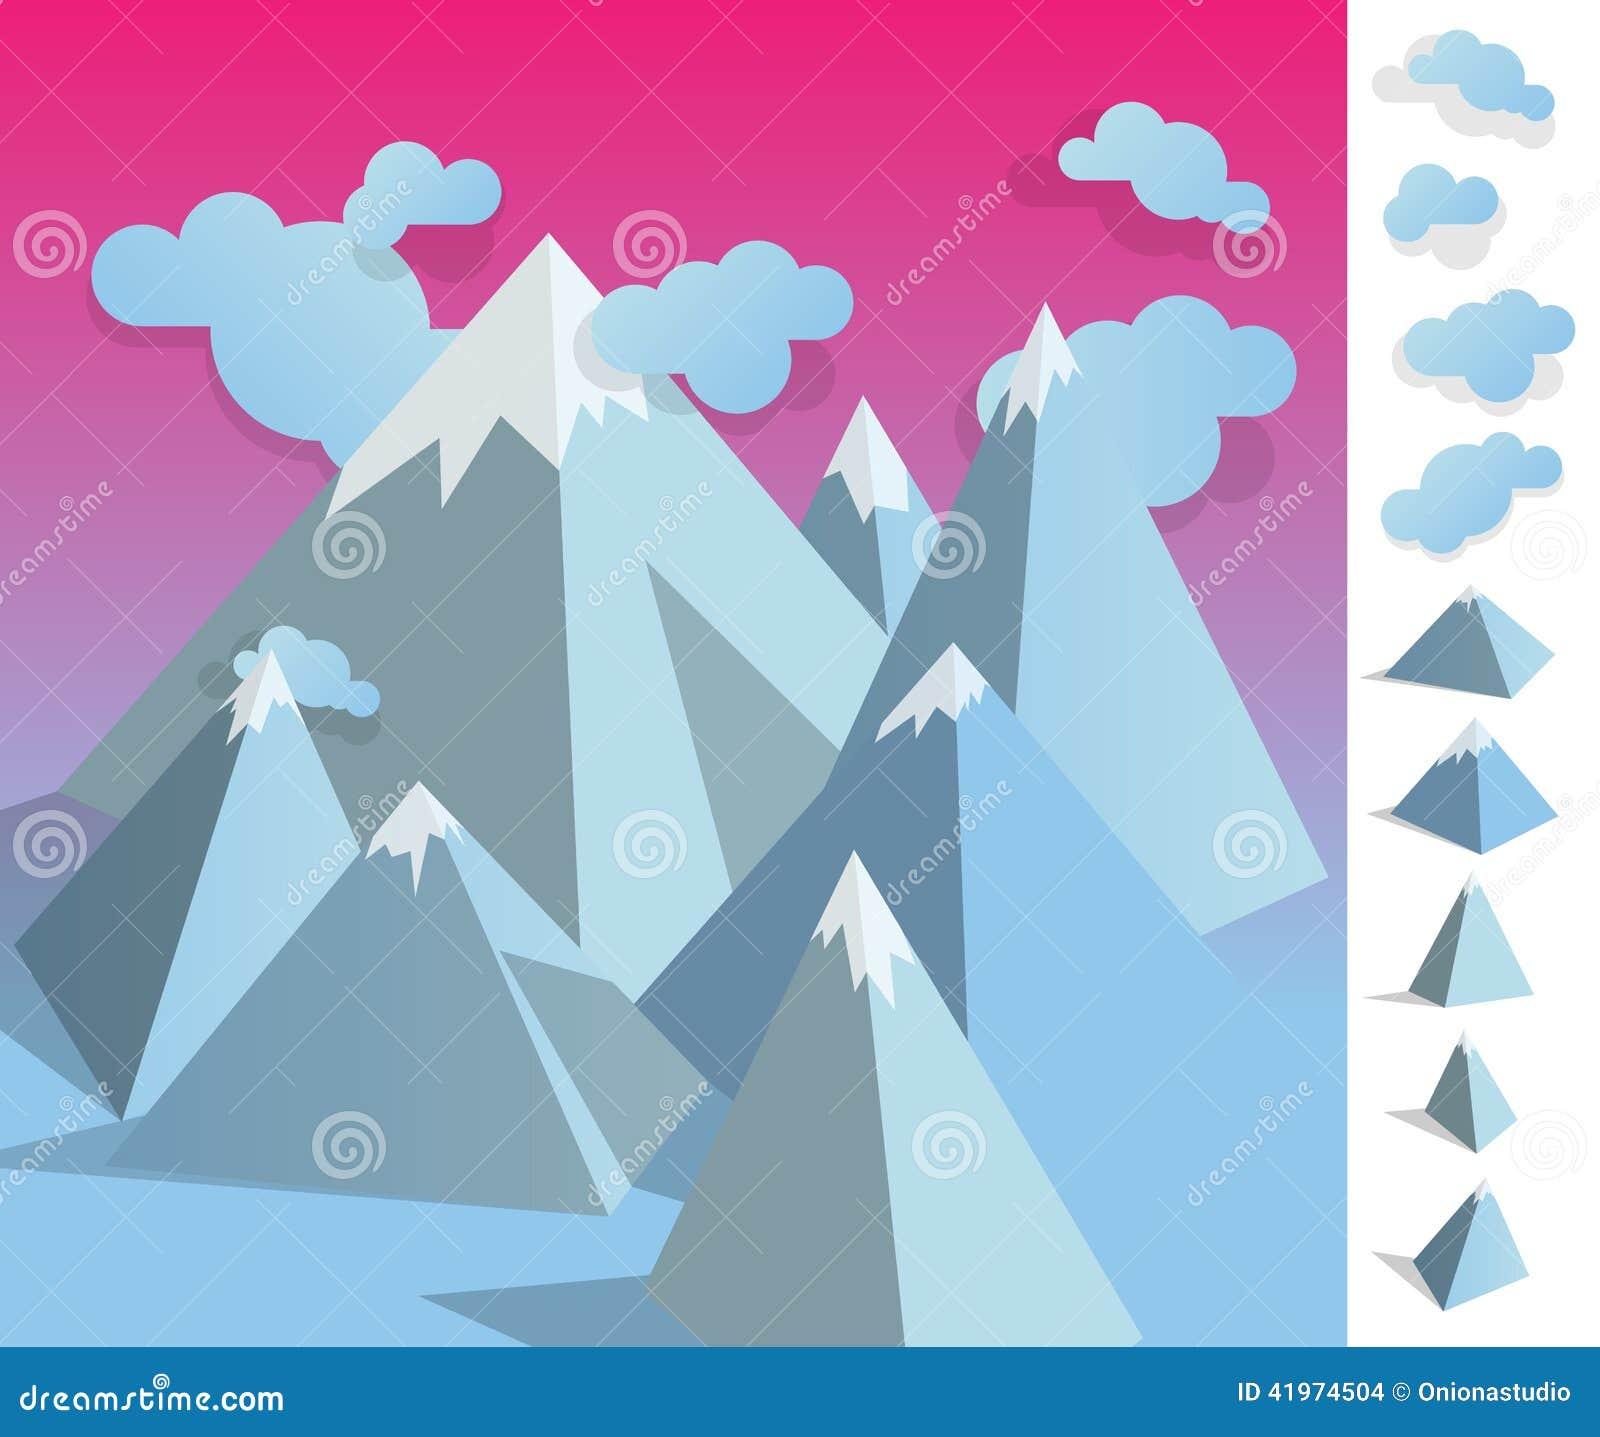 Illustration Of Geometric Iceberg Mountain Landscape Stock